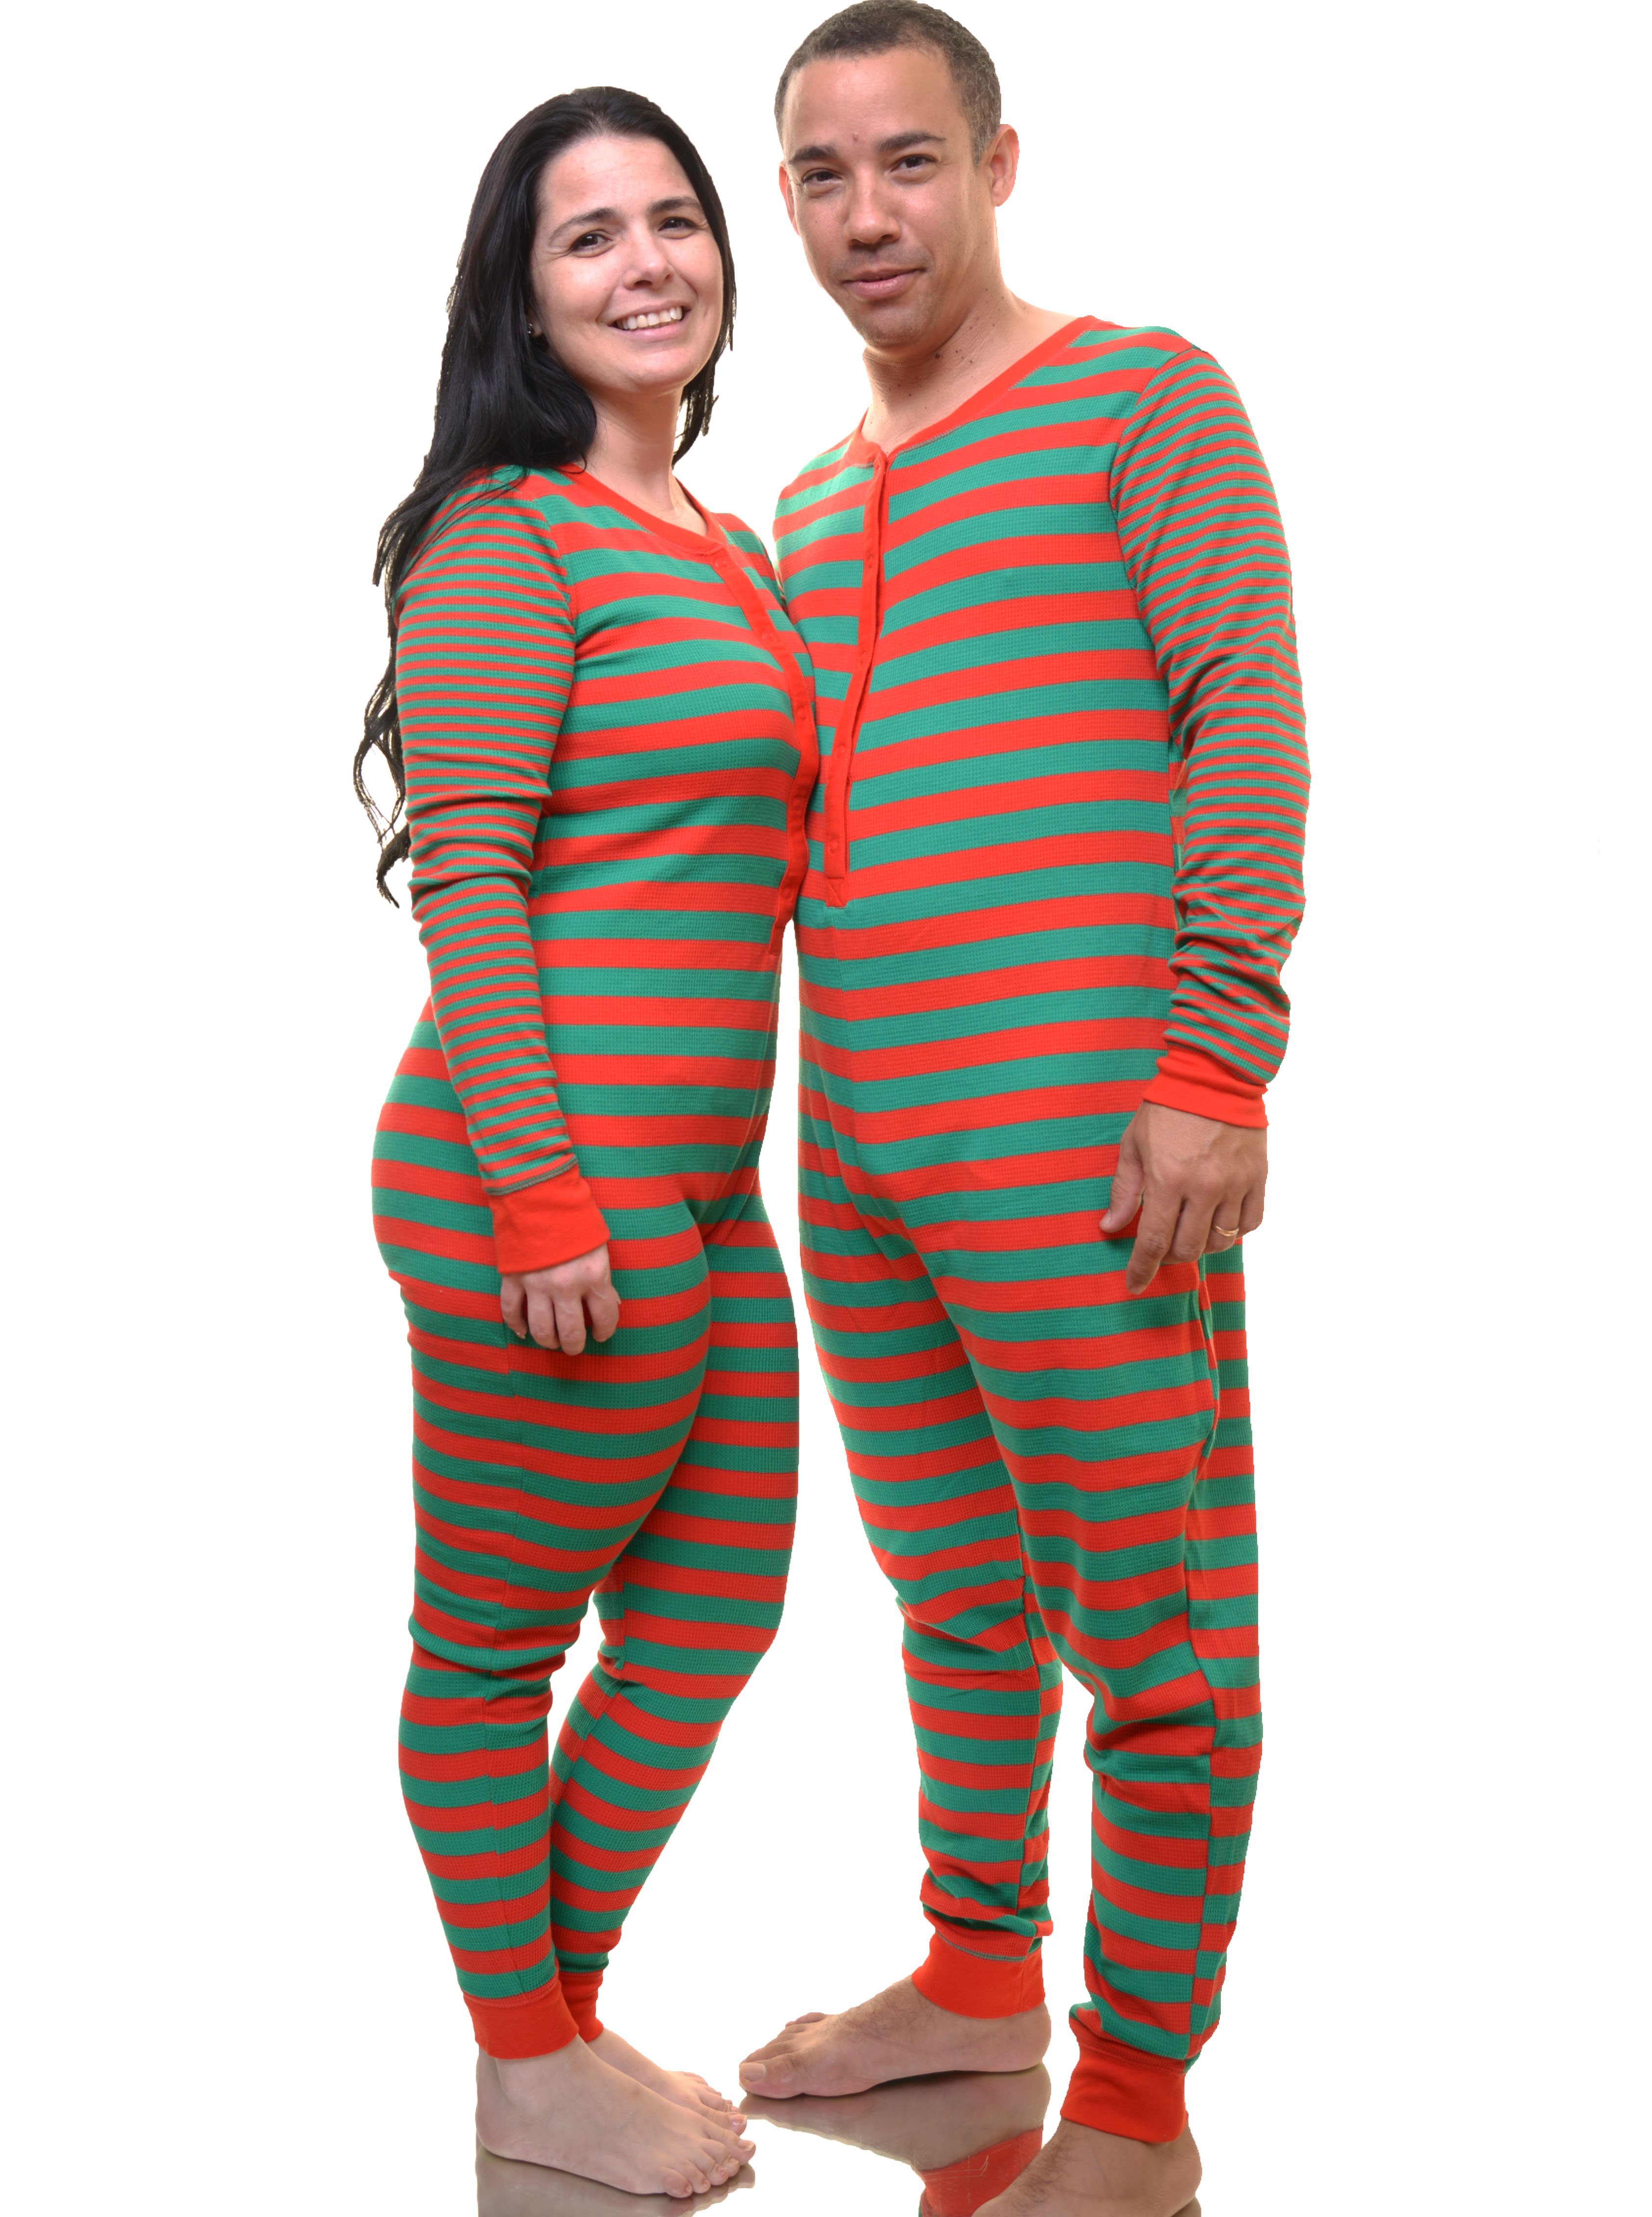 Christmas Jumpsuit Pajamas.Christmas Stripes Unisex Pajama Sleep Jumpsuit Size Xs